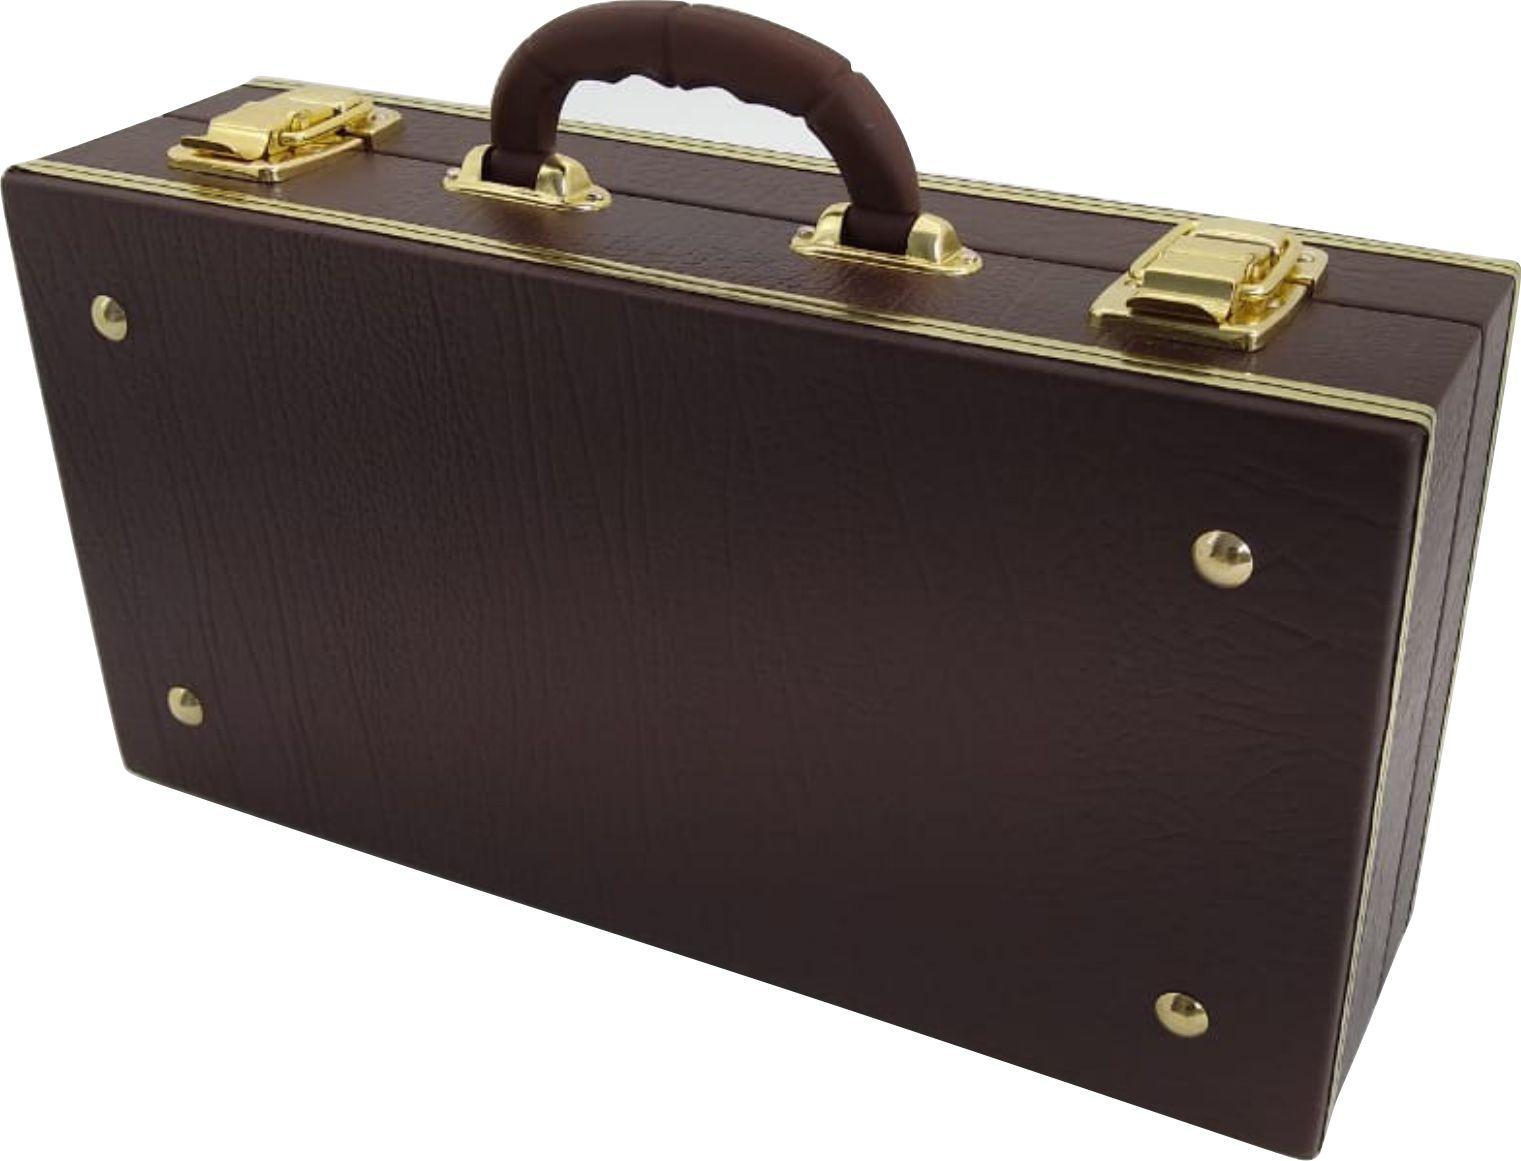 Estojo Case para Clarineta ou Clarinete Fundo Falso Luxo Marrom